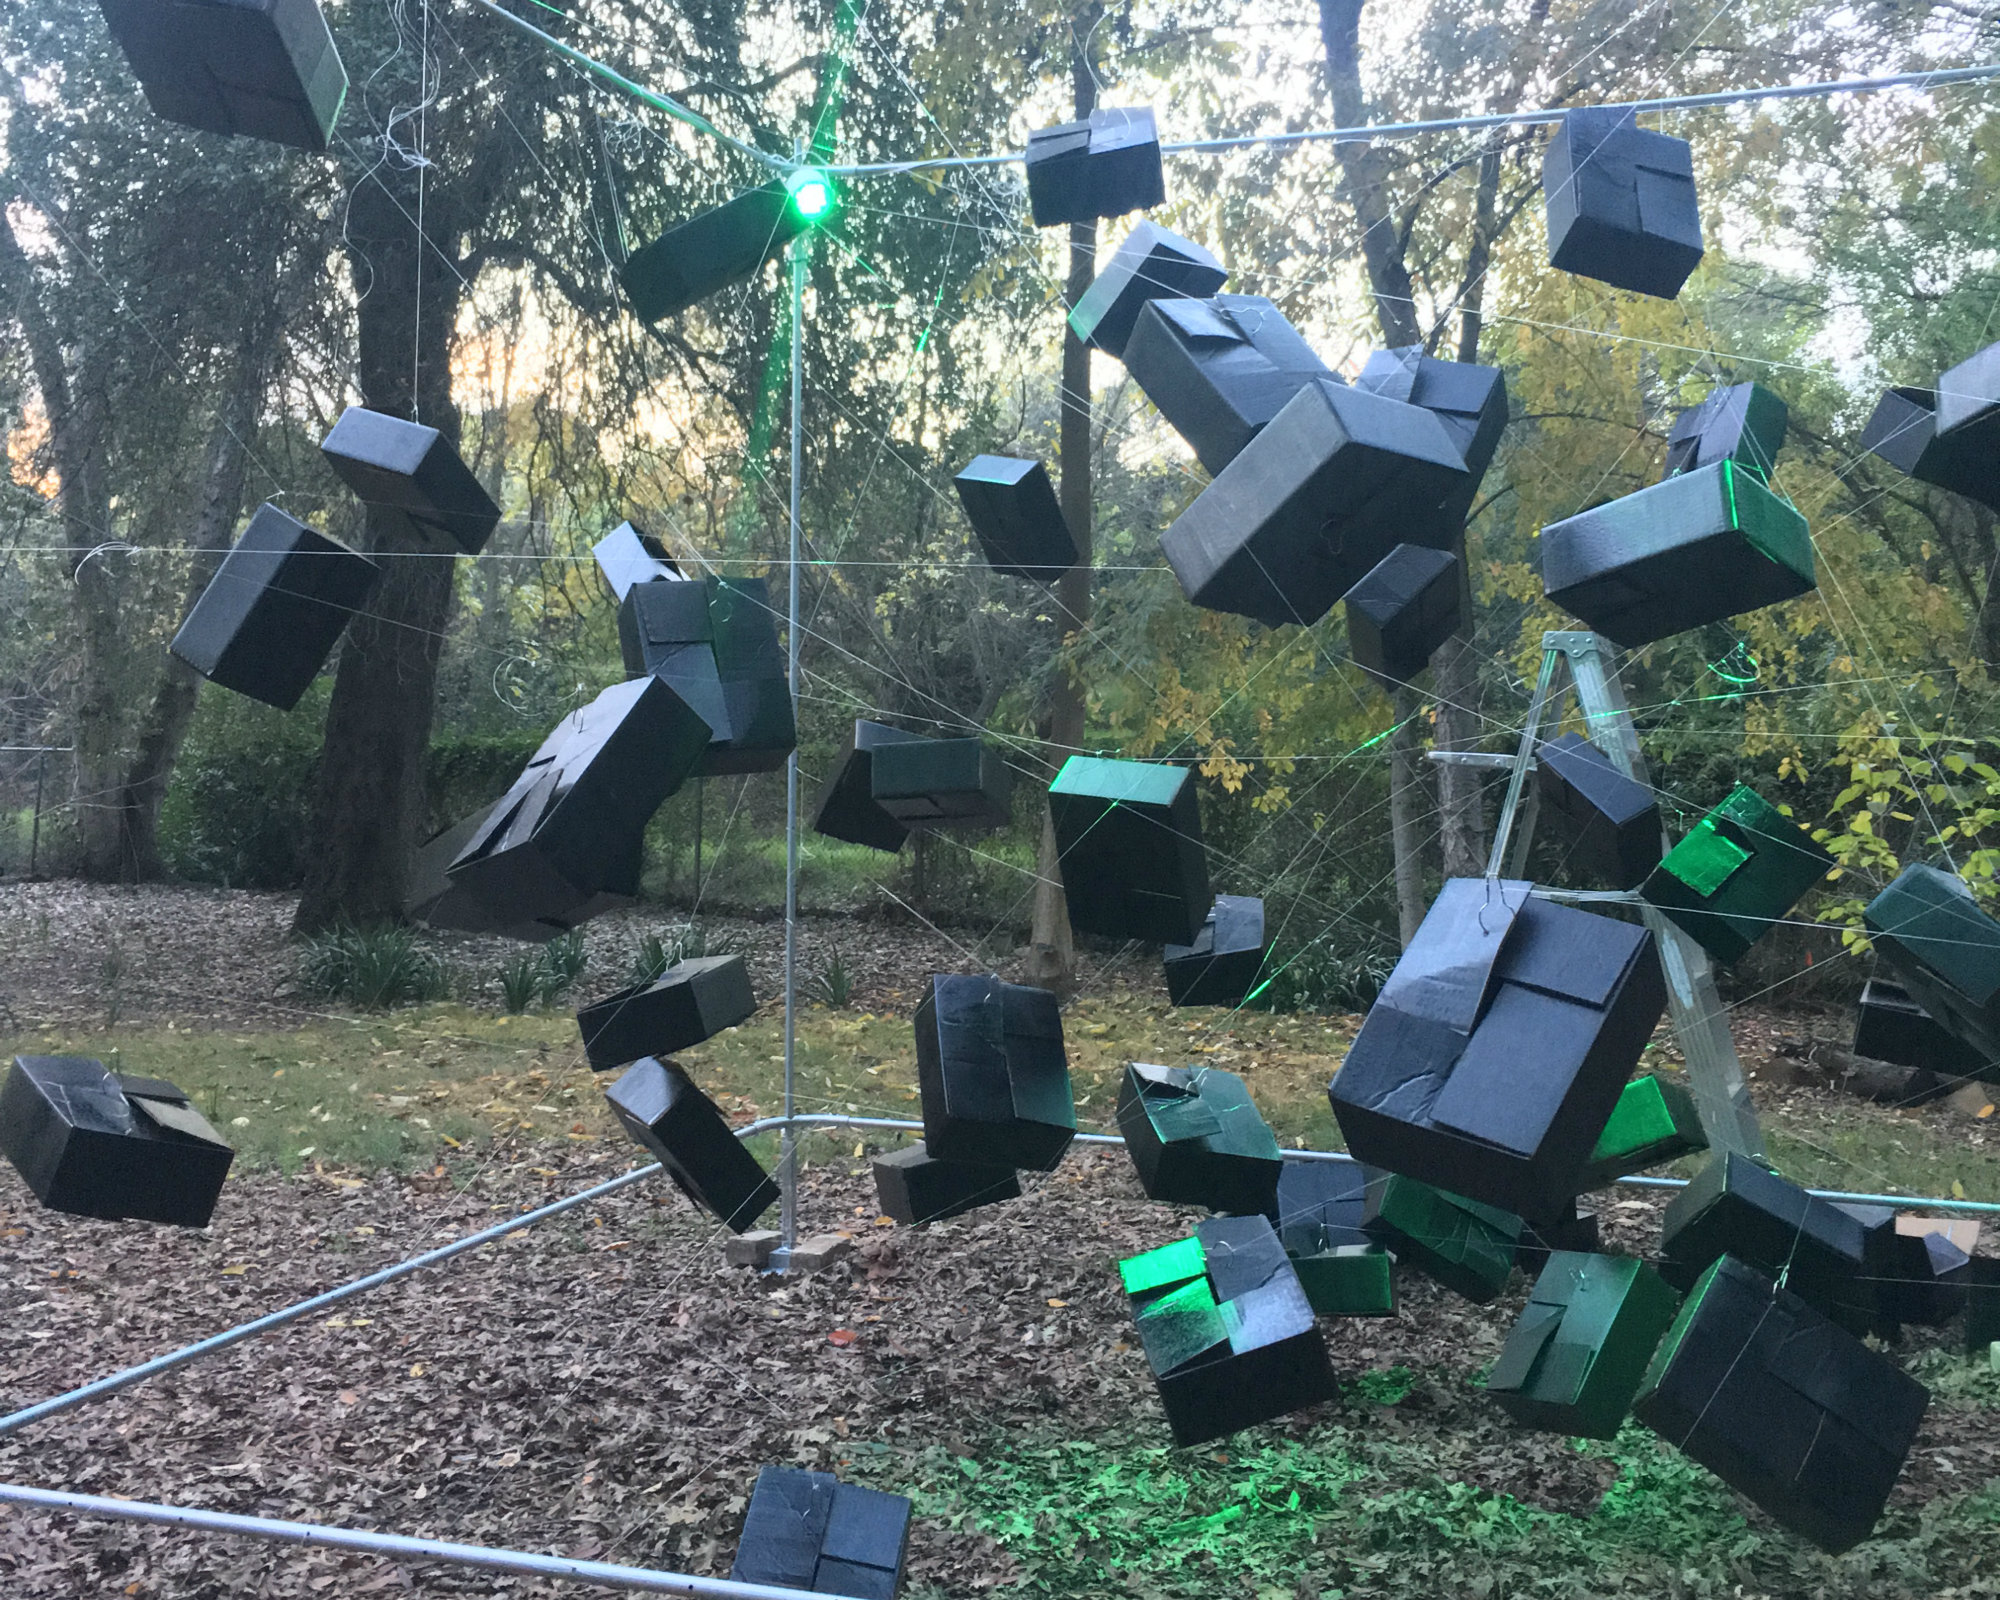 Senior art major Tammy Helenske's elaborate set for her performance at show entitled